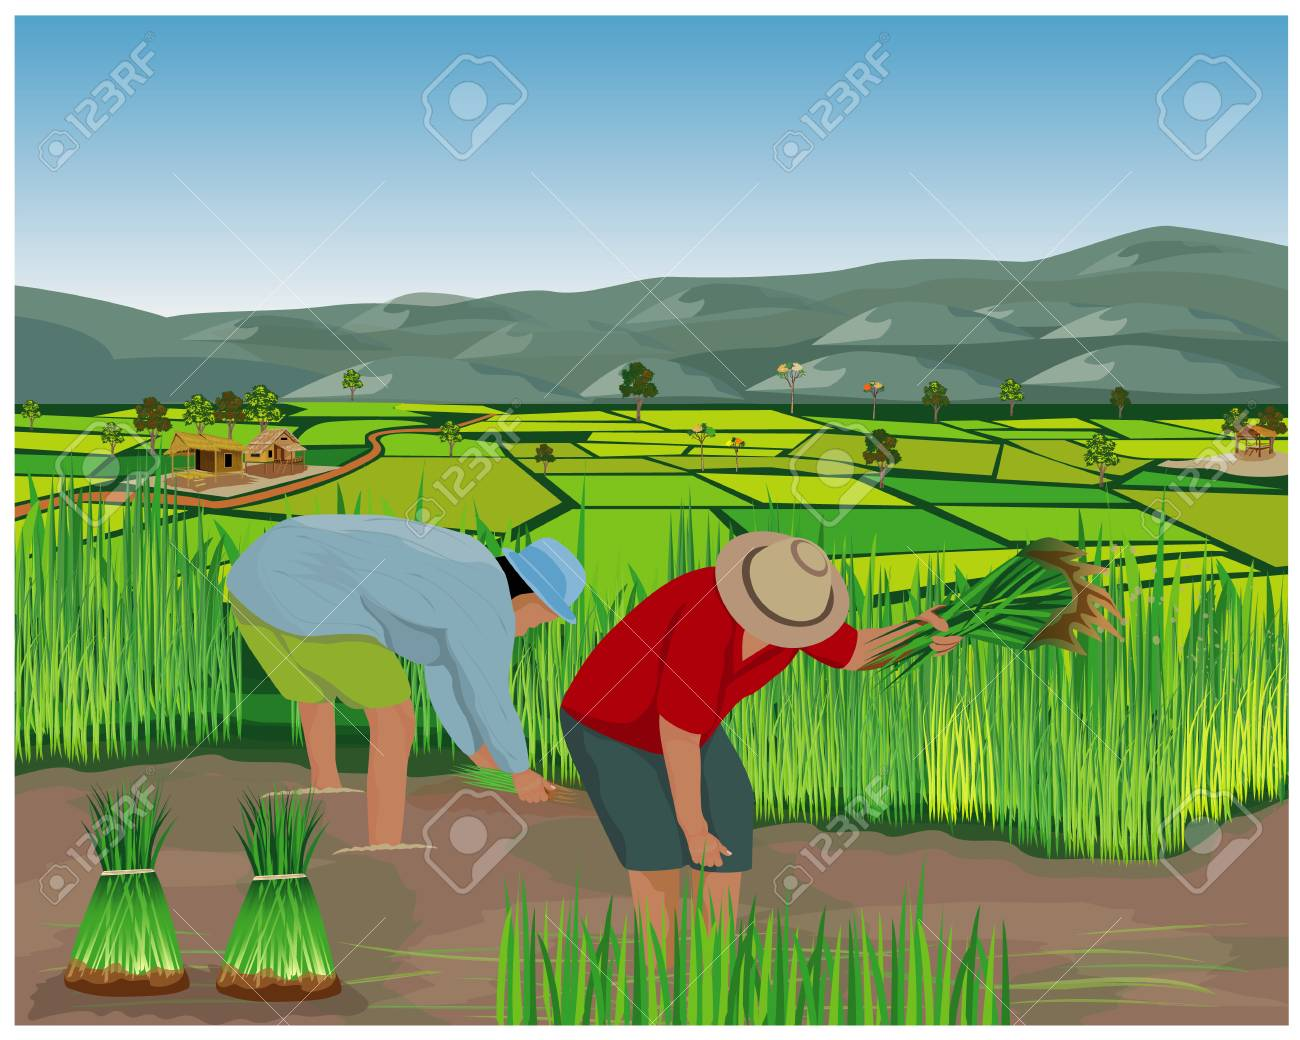 farmer work in paddy field vector design - 110831643